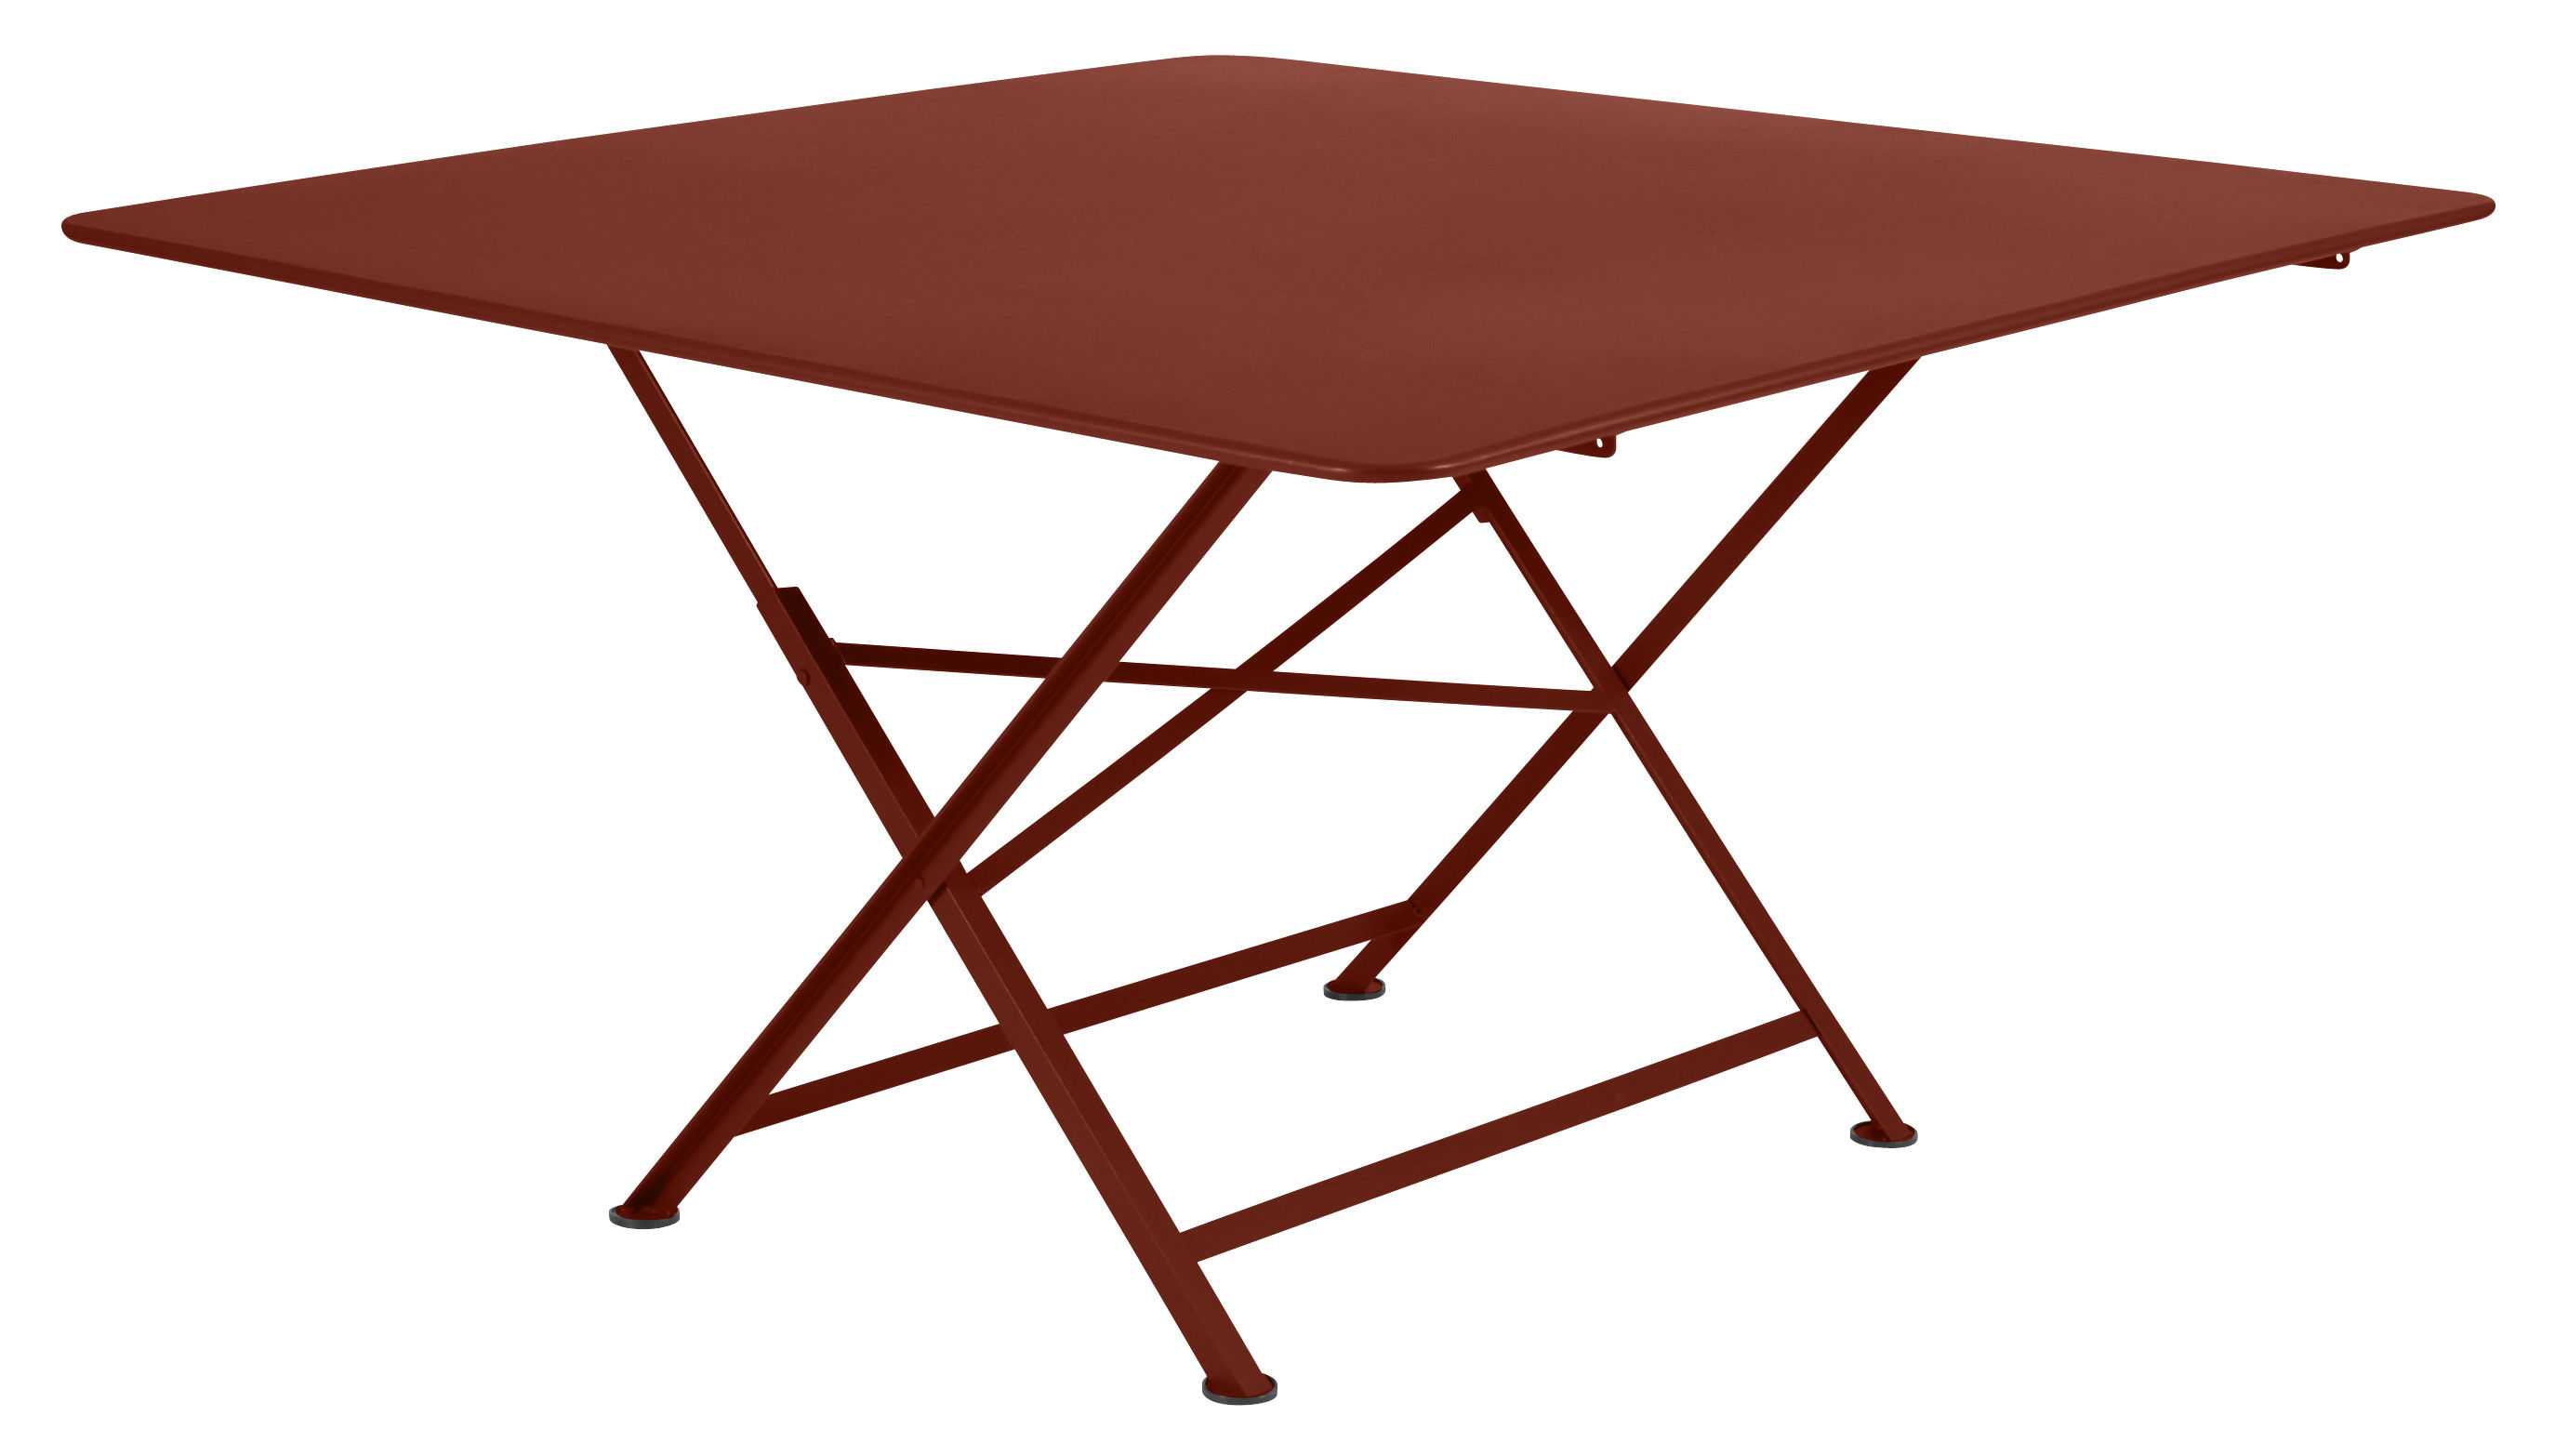 Table pliante Cargo / 128 x 128 cm - Fermob